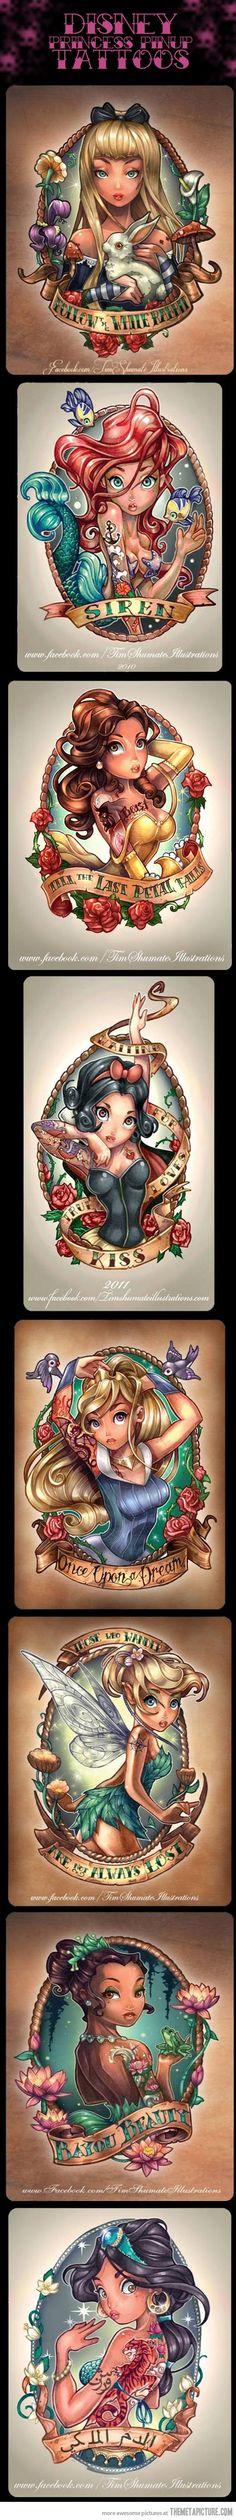 8 Very Cool Disney Princess Pinup Tattoos…